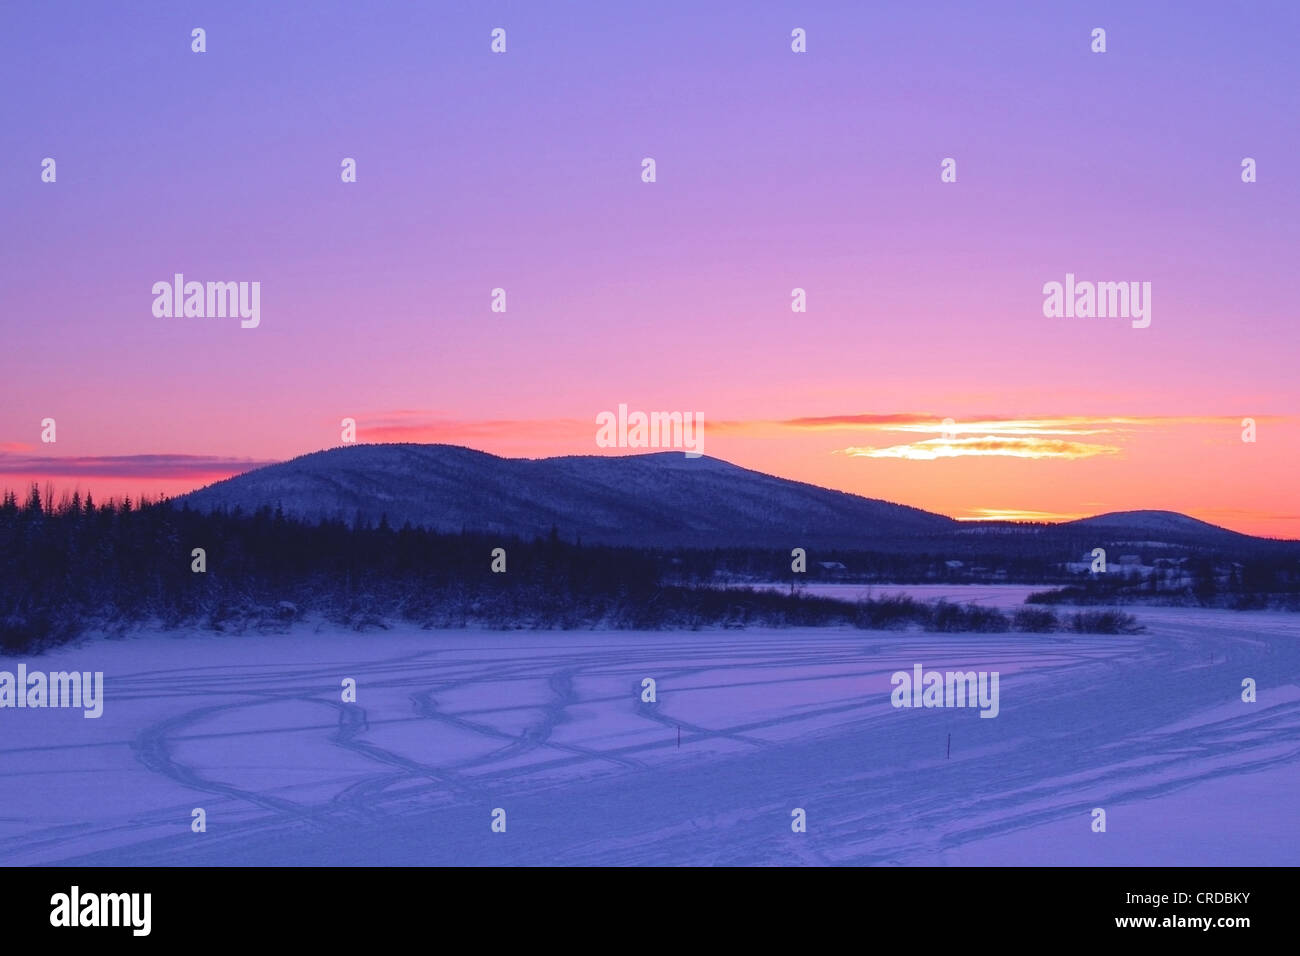 Eventide at lake Sirkka, Finland, Lapland - Stock Image